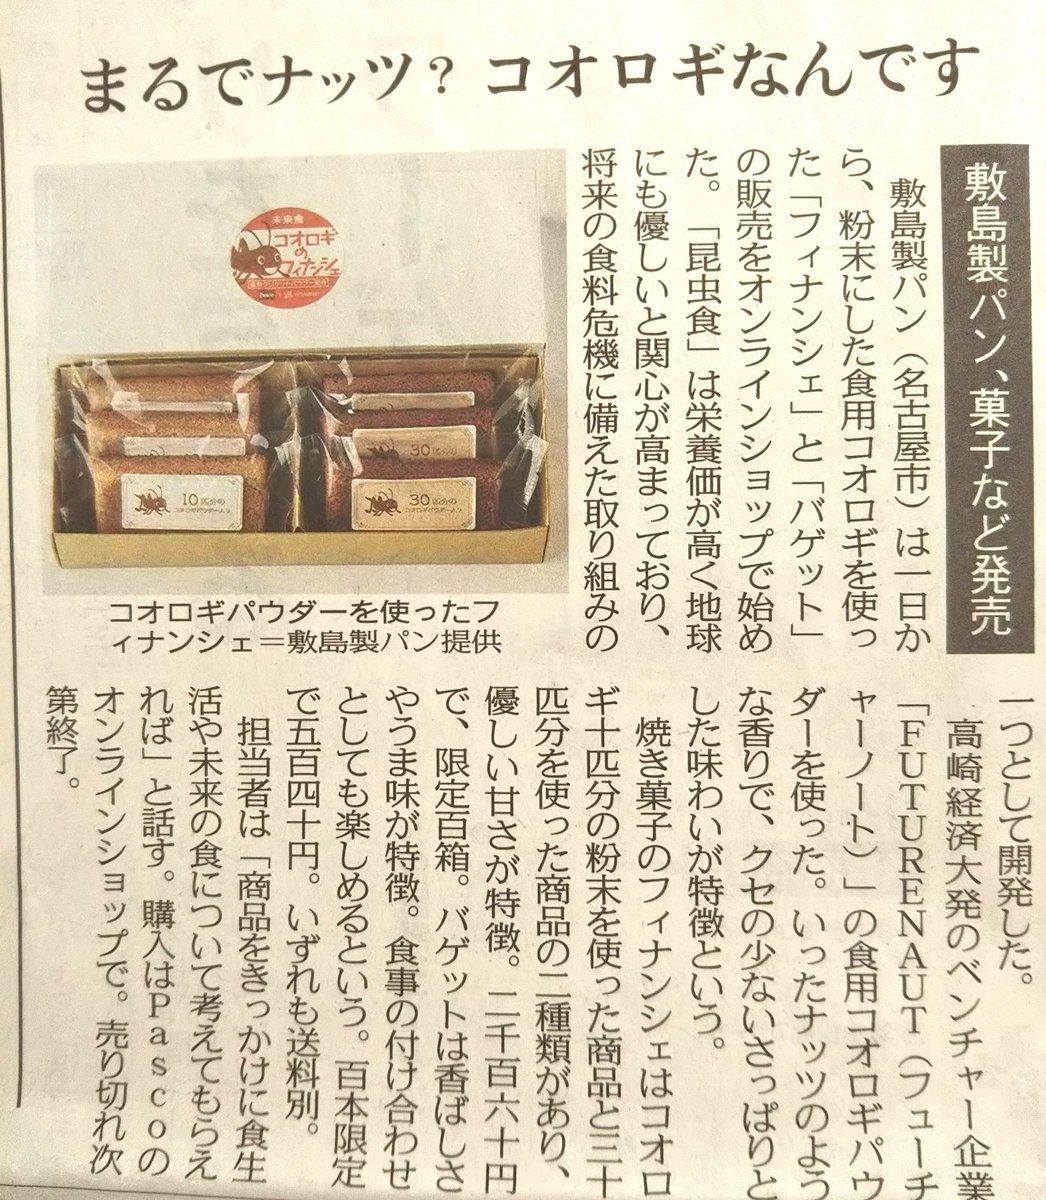 test ツイッターメディア - 敷島製パンのコオロギパウダー入りのパンとフィナンシェ。  買おうと思ったら、もう売りきれ。 ぴえん💦 https://t.co/p6B0D1iv3a